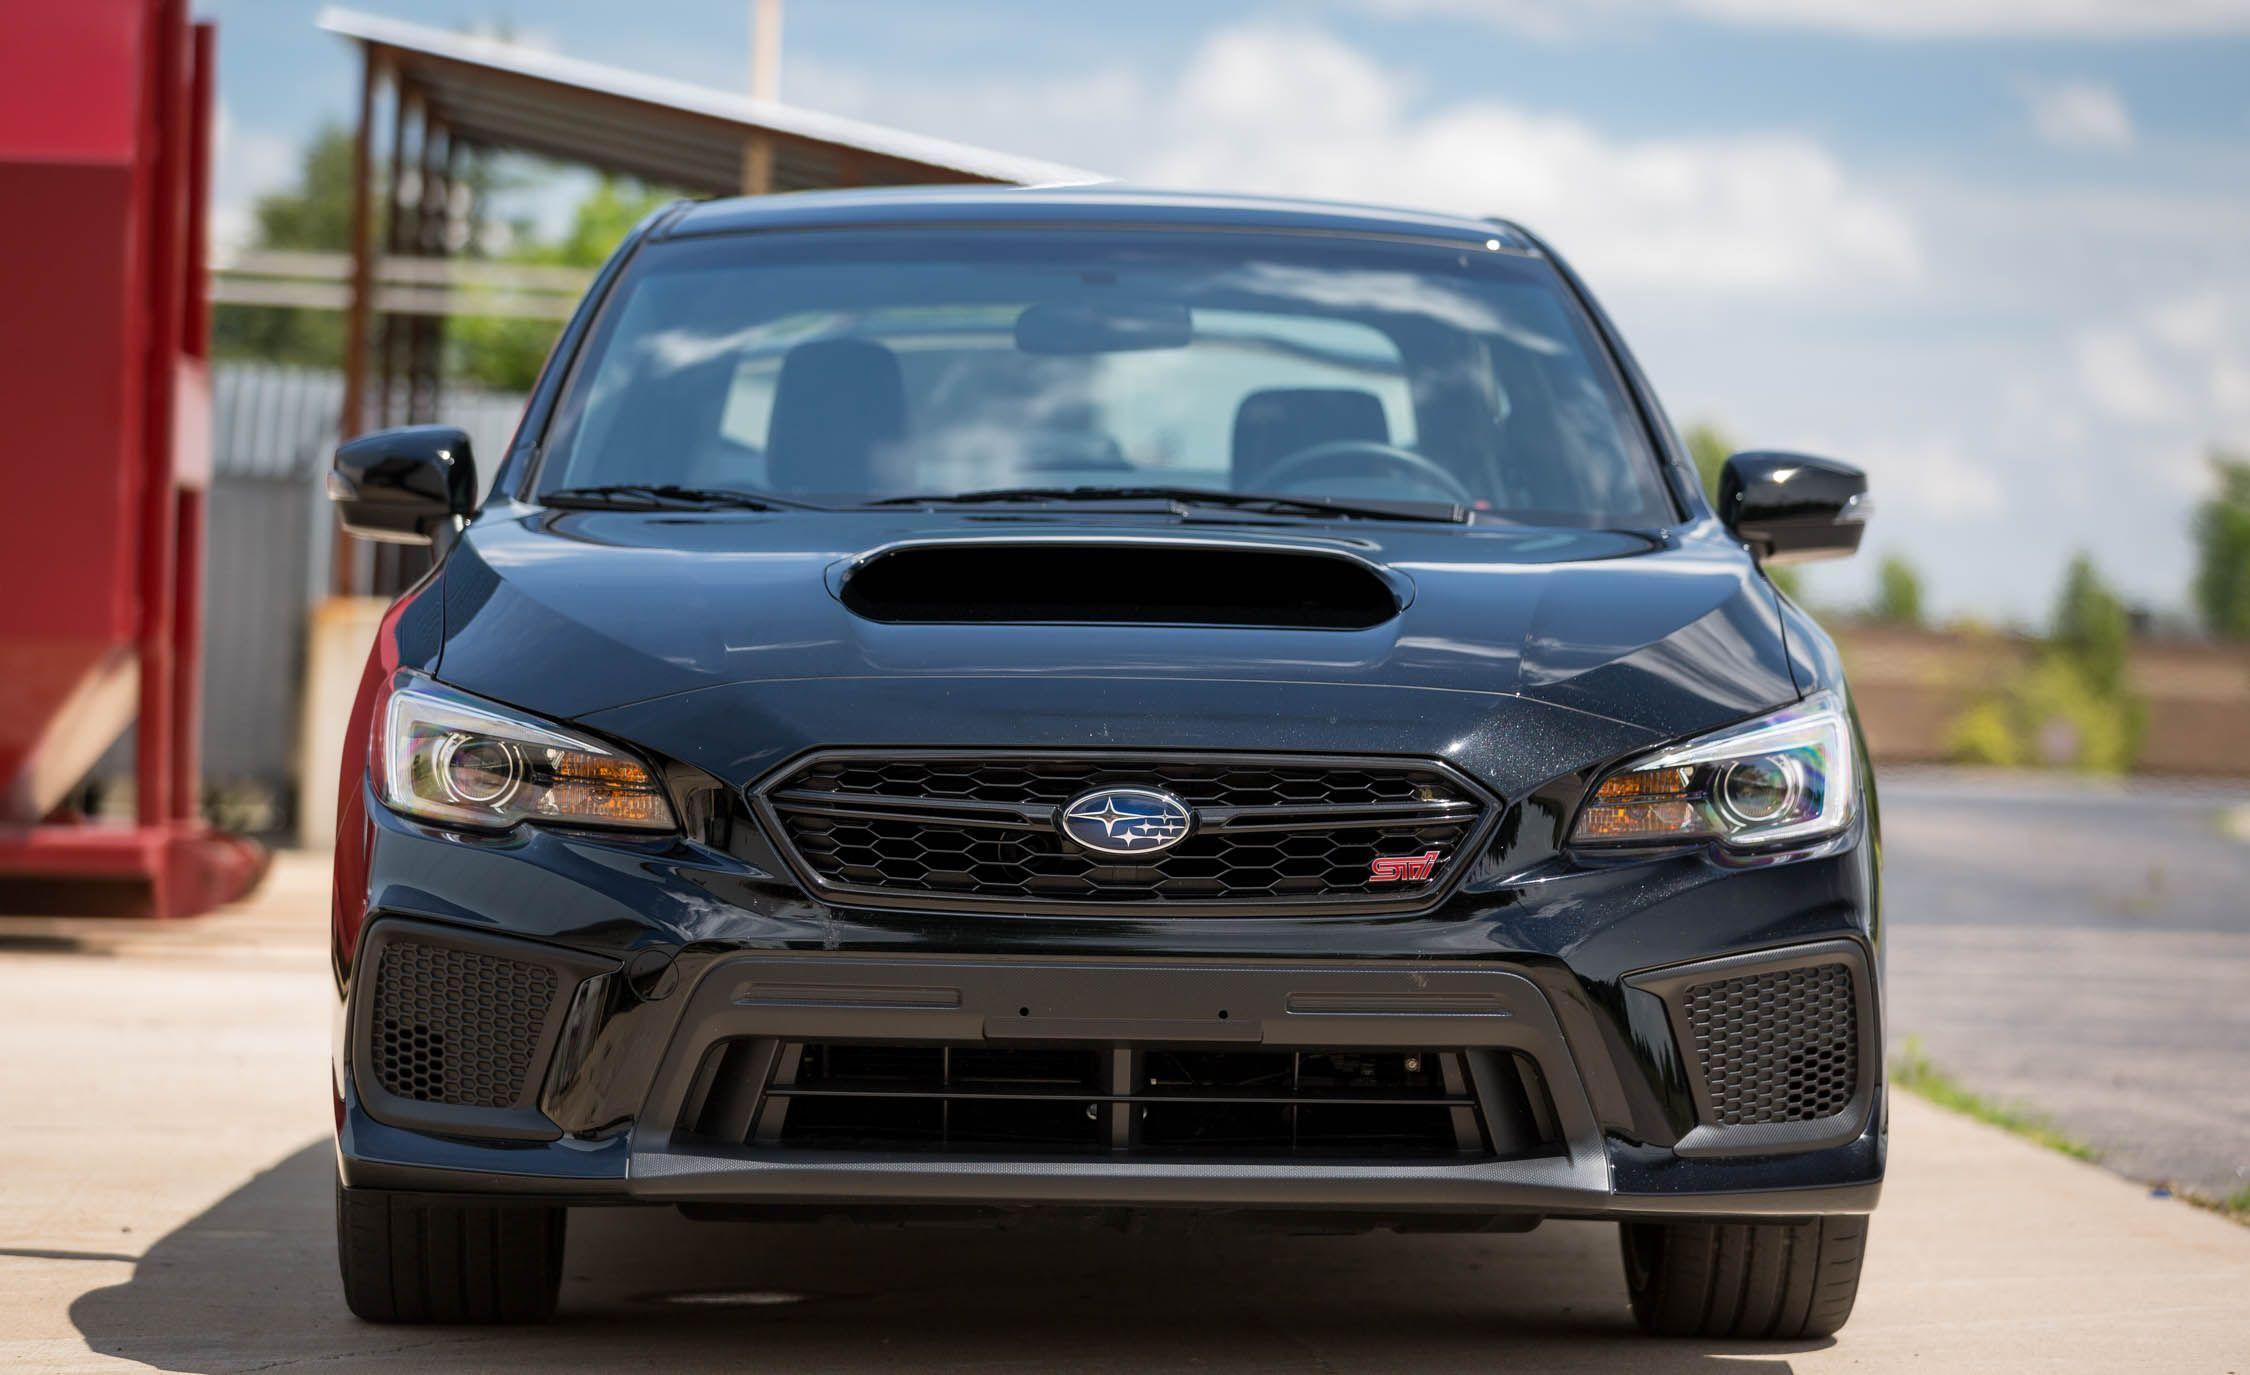 2018 subaru wrx sti engine and transmission review car and driver. Black Bedroom Furniture Sets. Home Design Ideas